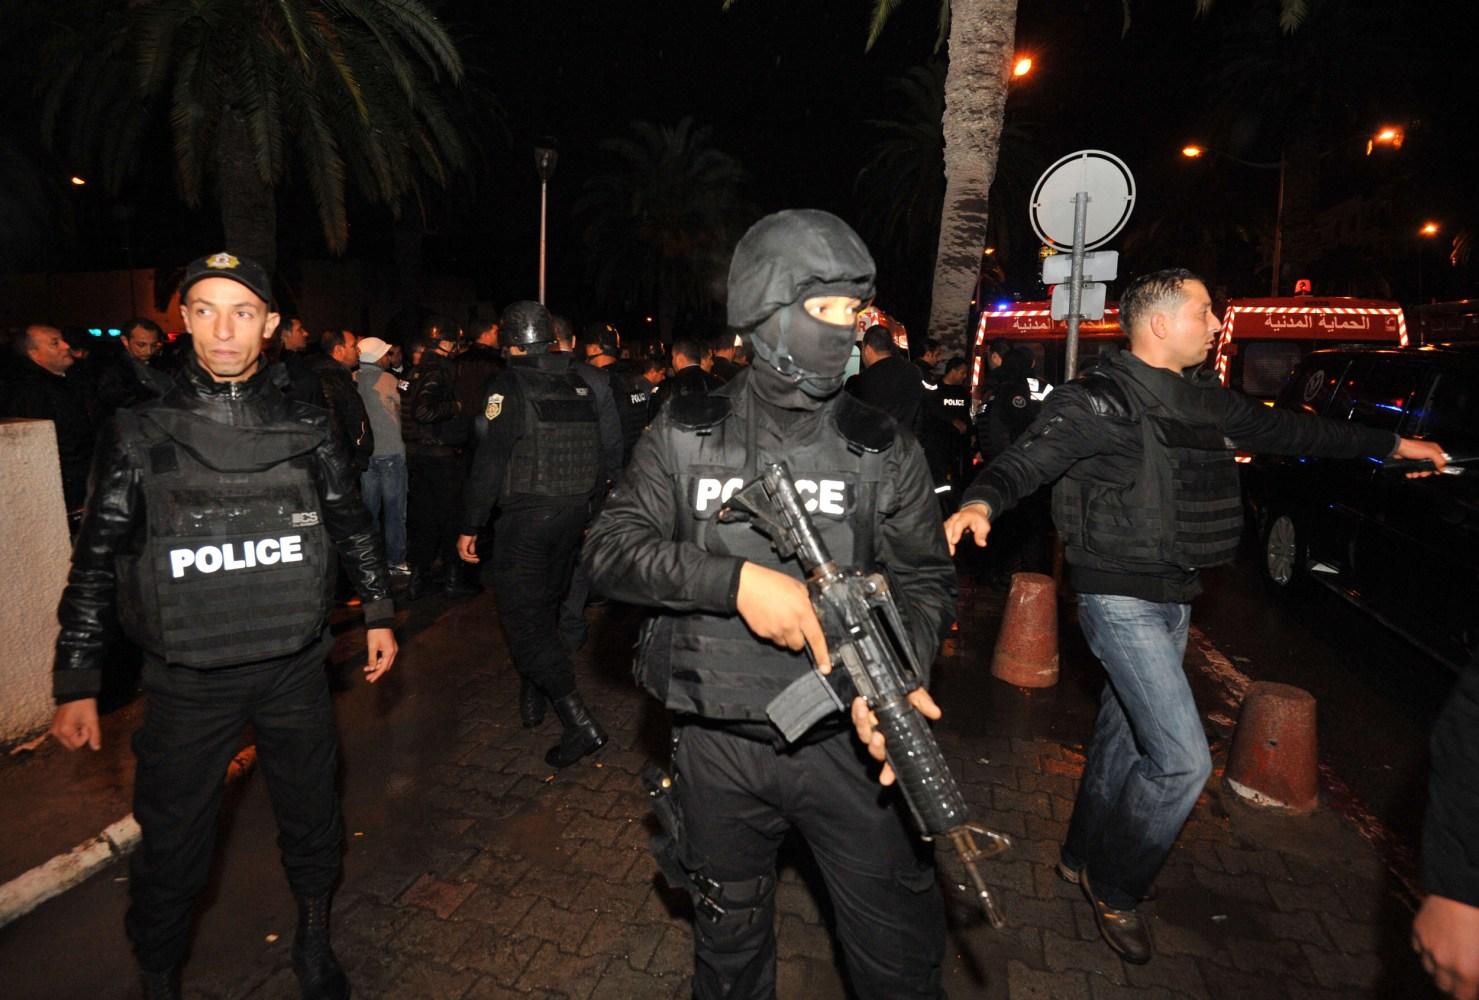 151124-tunisia-bus-explosion-233p_9914d5bc142bca8076d96e007a5331d1.nbcnews-ux-2880-1000.jpg